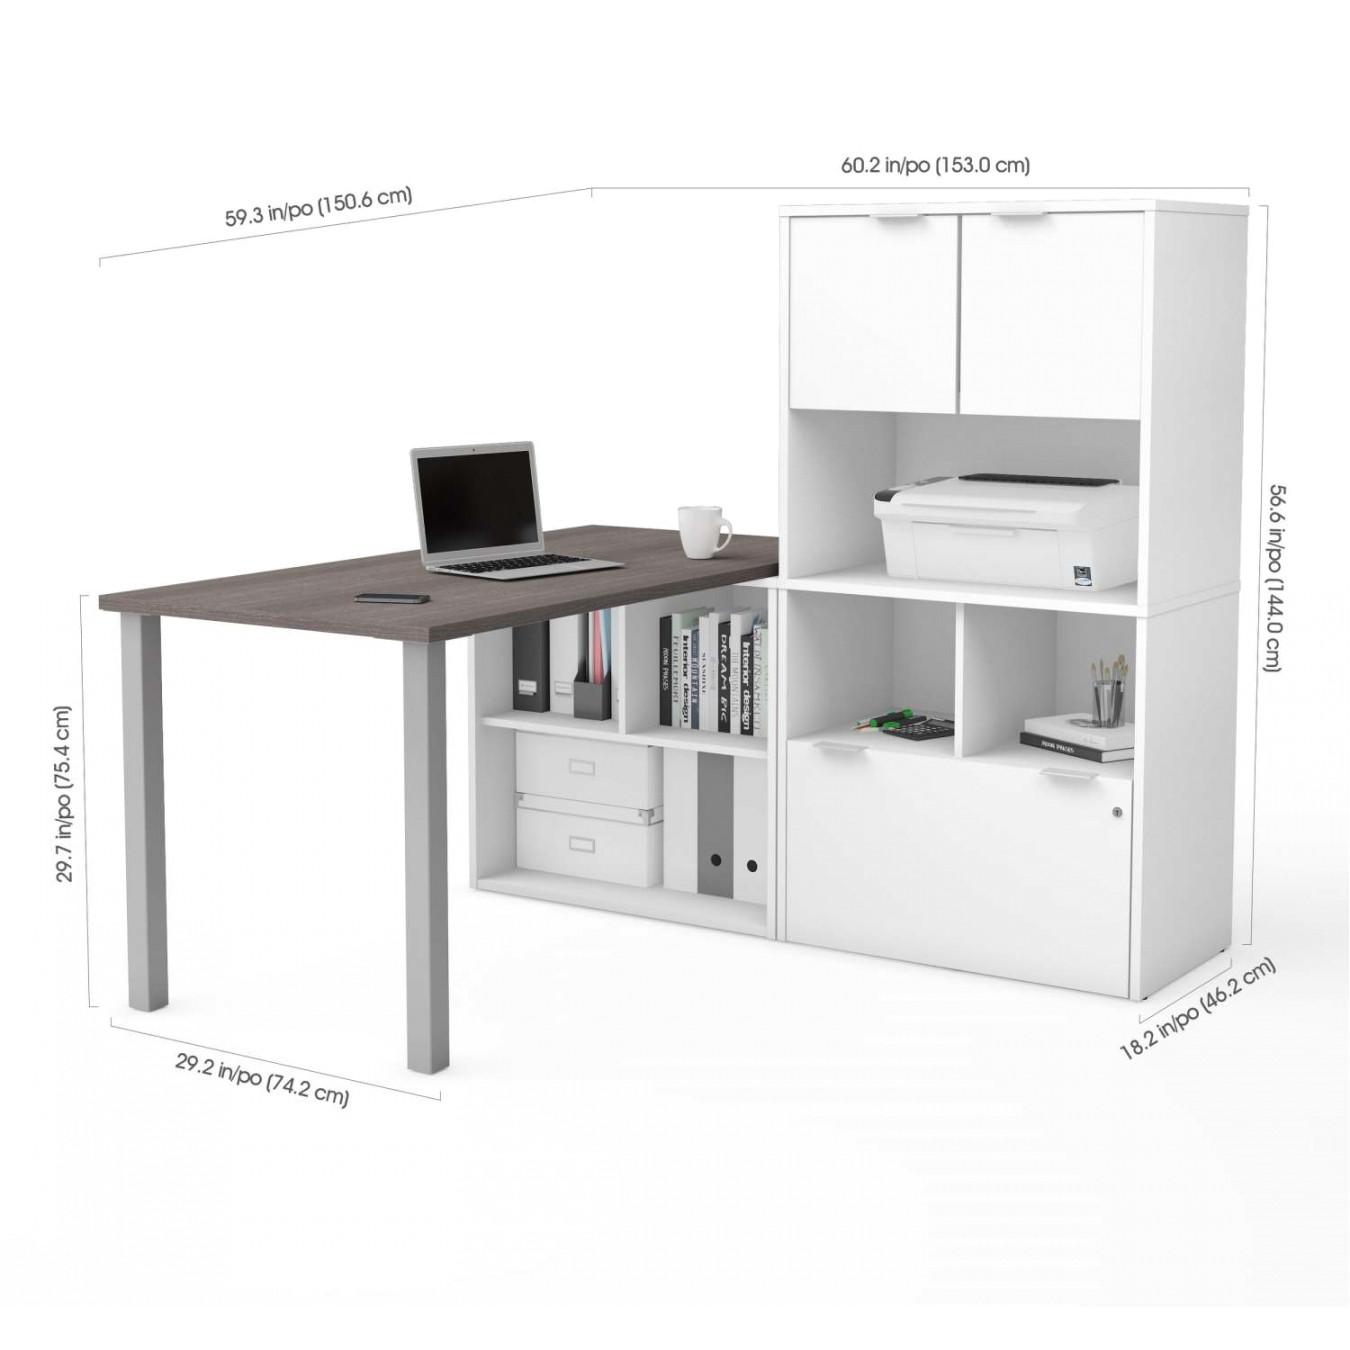 32 graphics standing puter desk ikea inspirational before 34 luxury room essentials desk instructions graphics desk